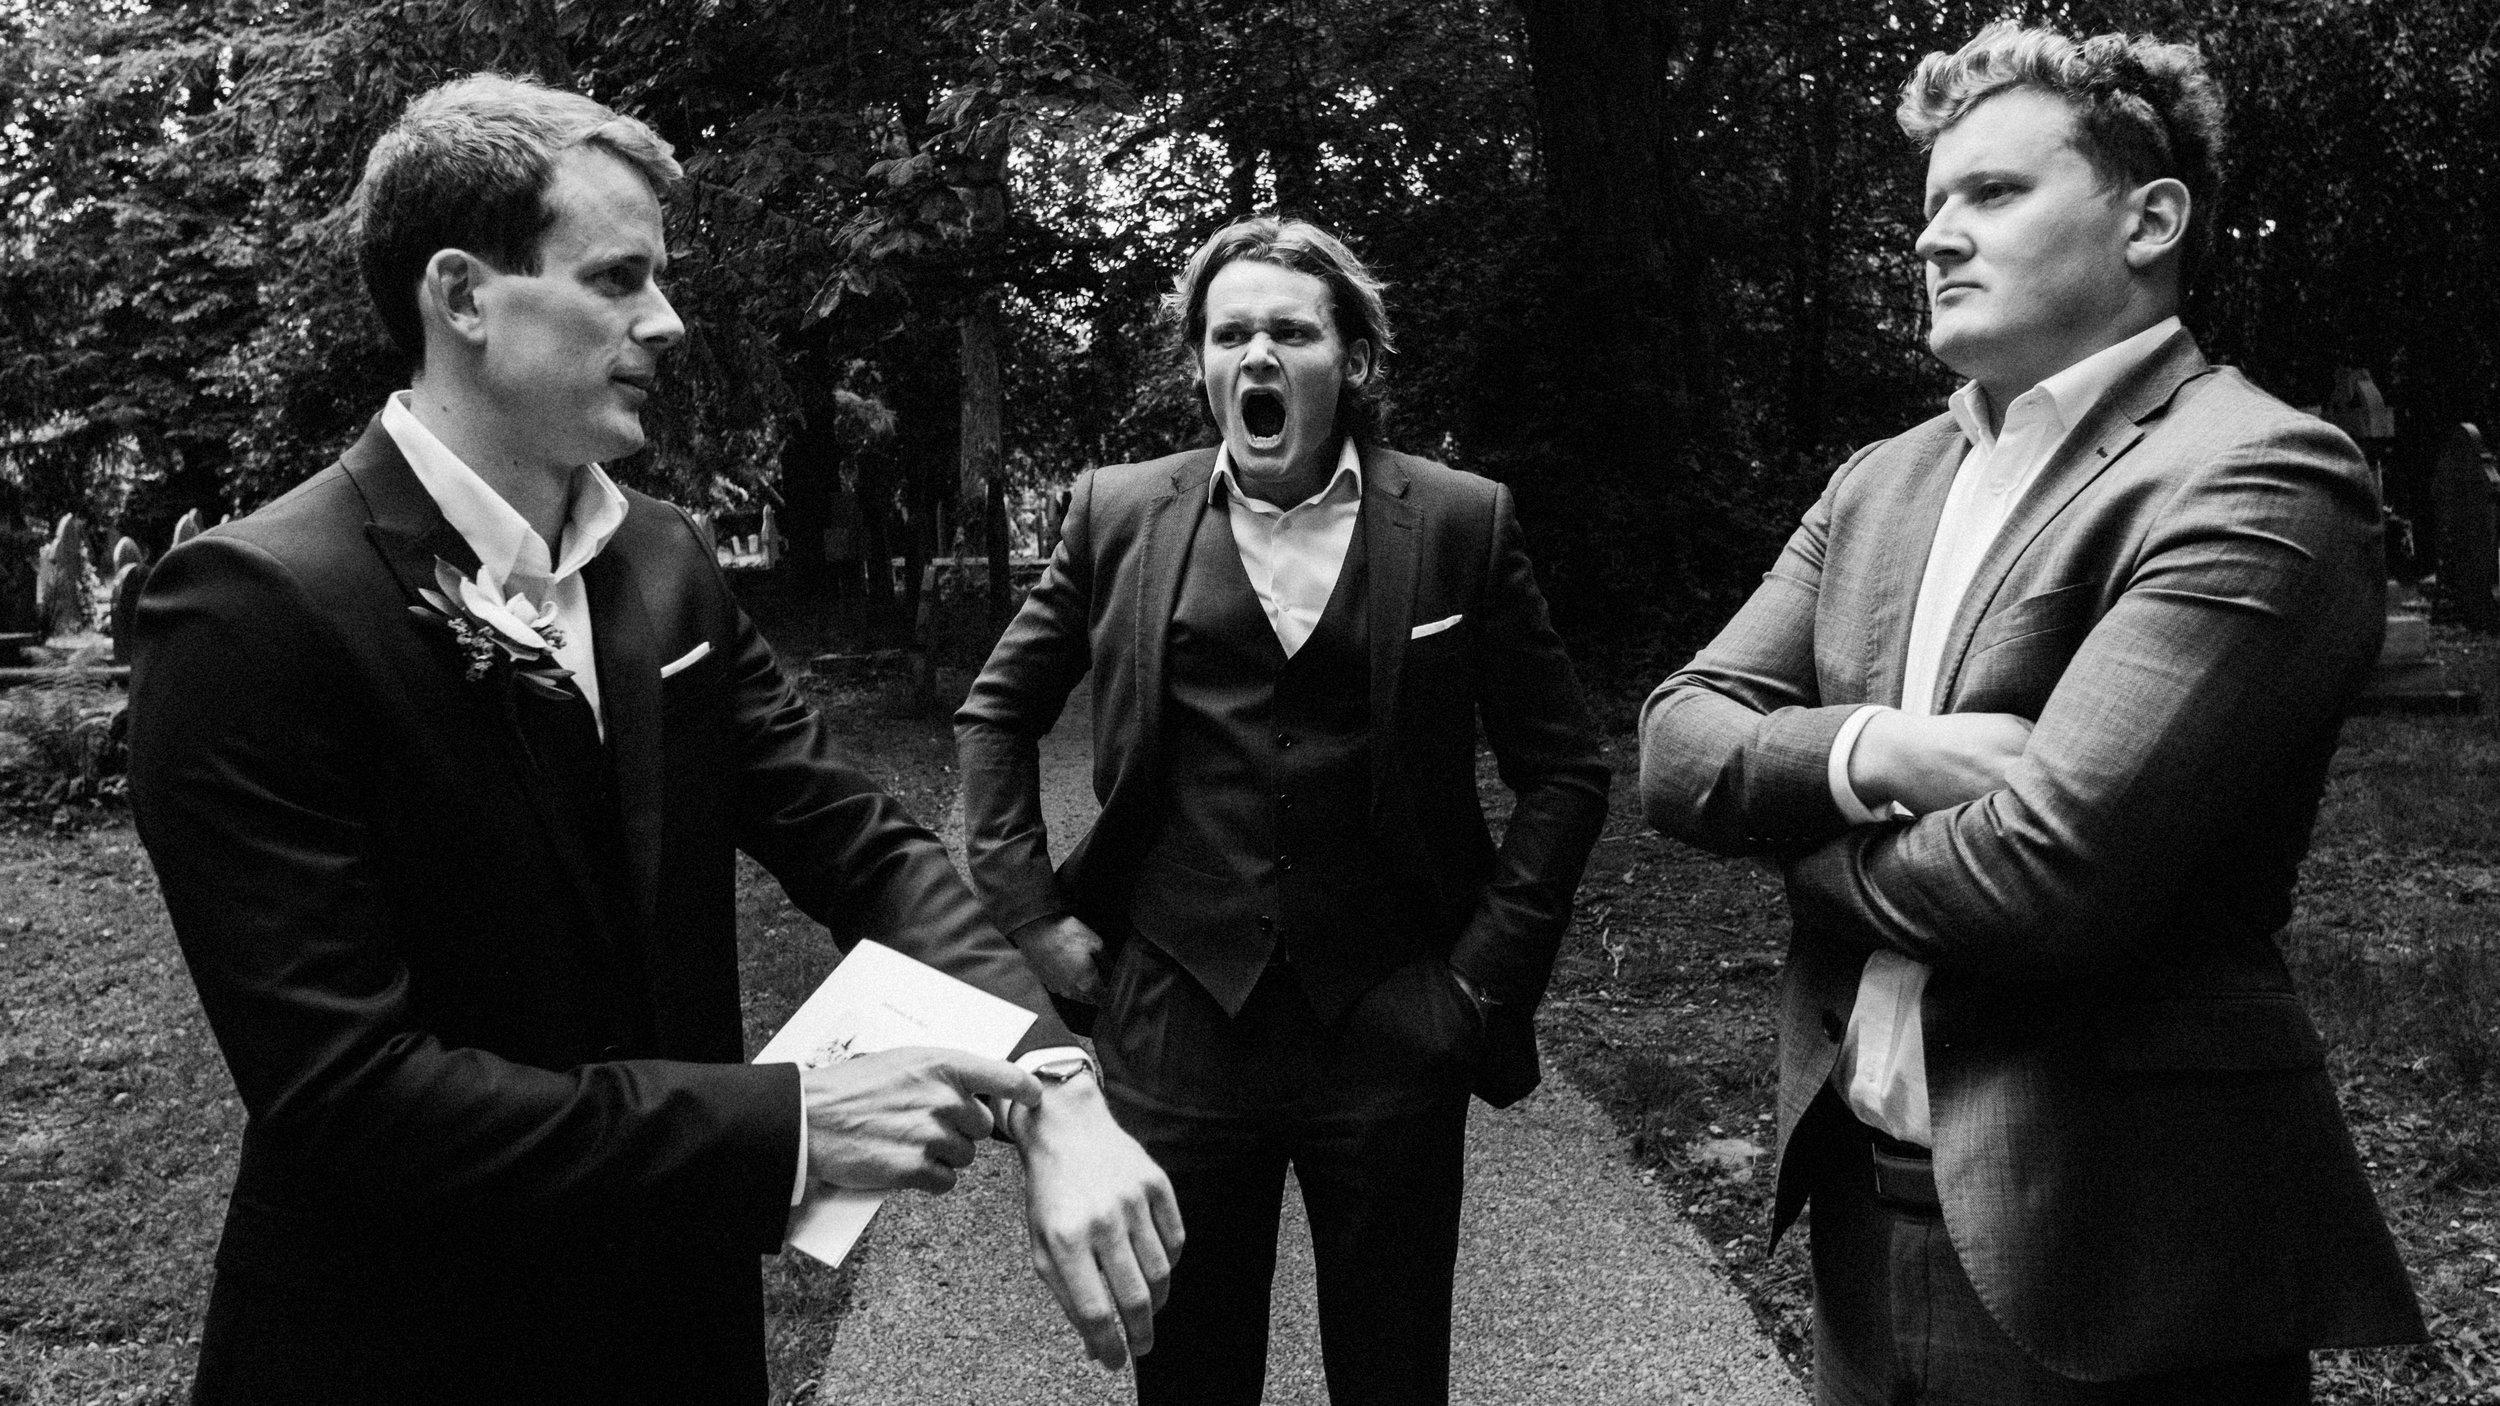 prestbury-cheshire-wedding-photographer-0003.JPG